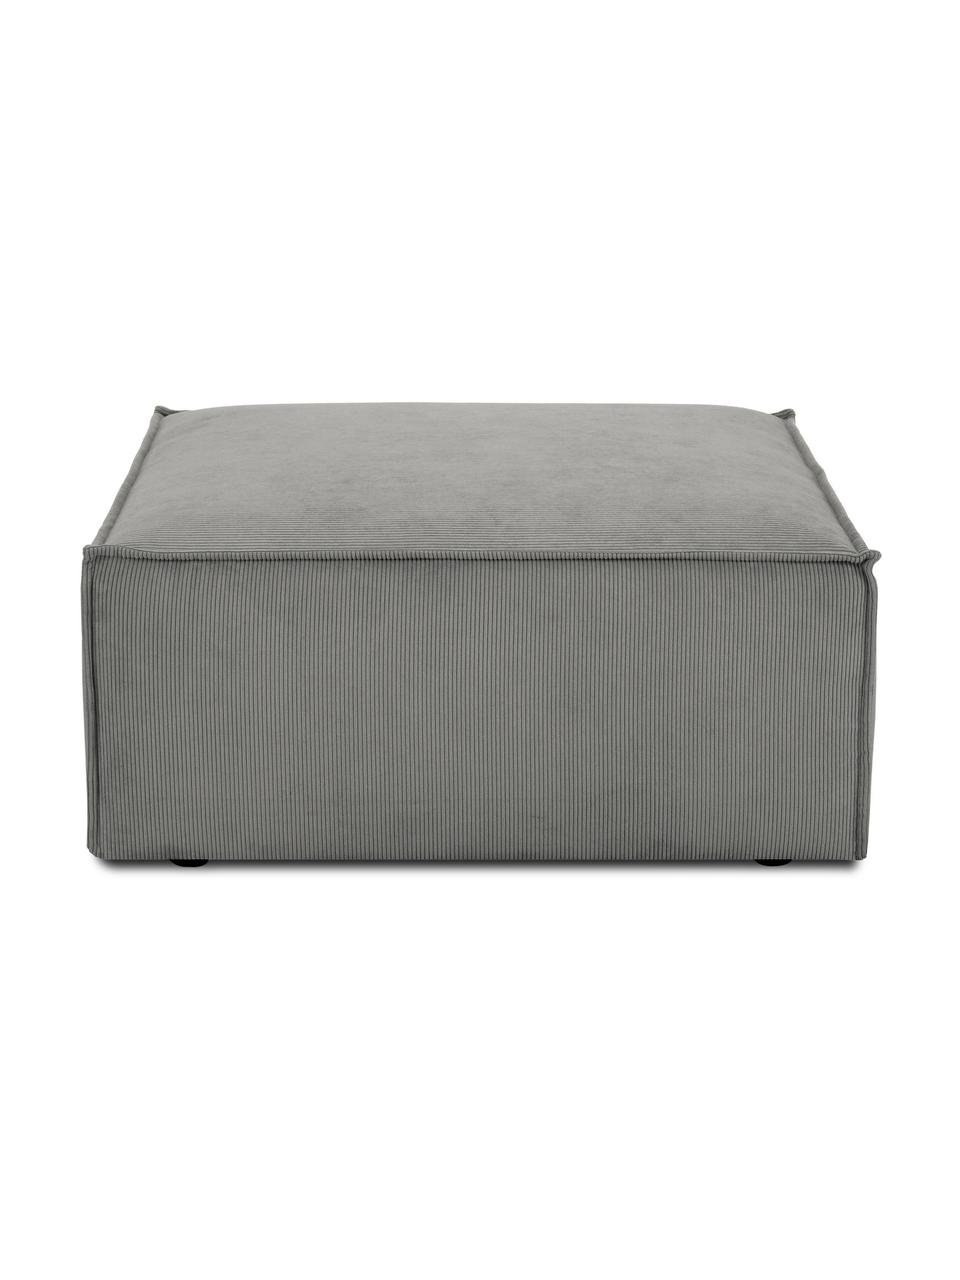 Sofa-Hocker Lennon in Grau aus Cord, Bezug: Cord (92% Polyester, 8% P, Gestell: Massives Kiefernholz, Spe, Füße: Kunststoff Die Füße befin, Cord Grau, 88 x 43 cm